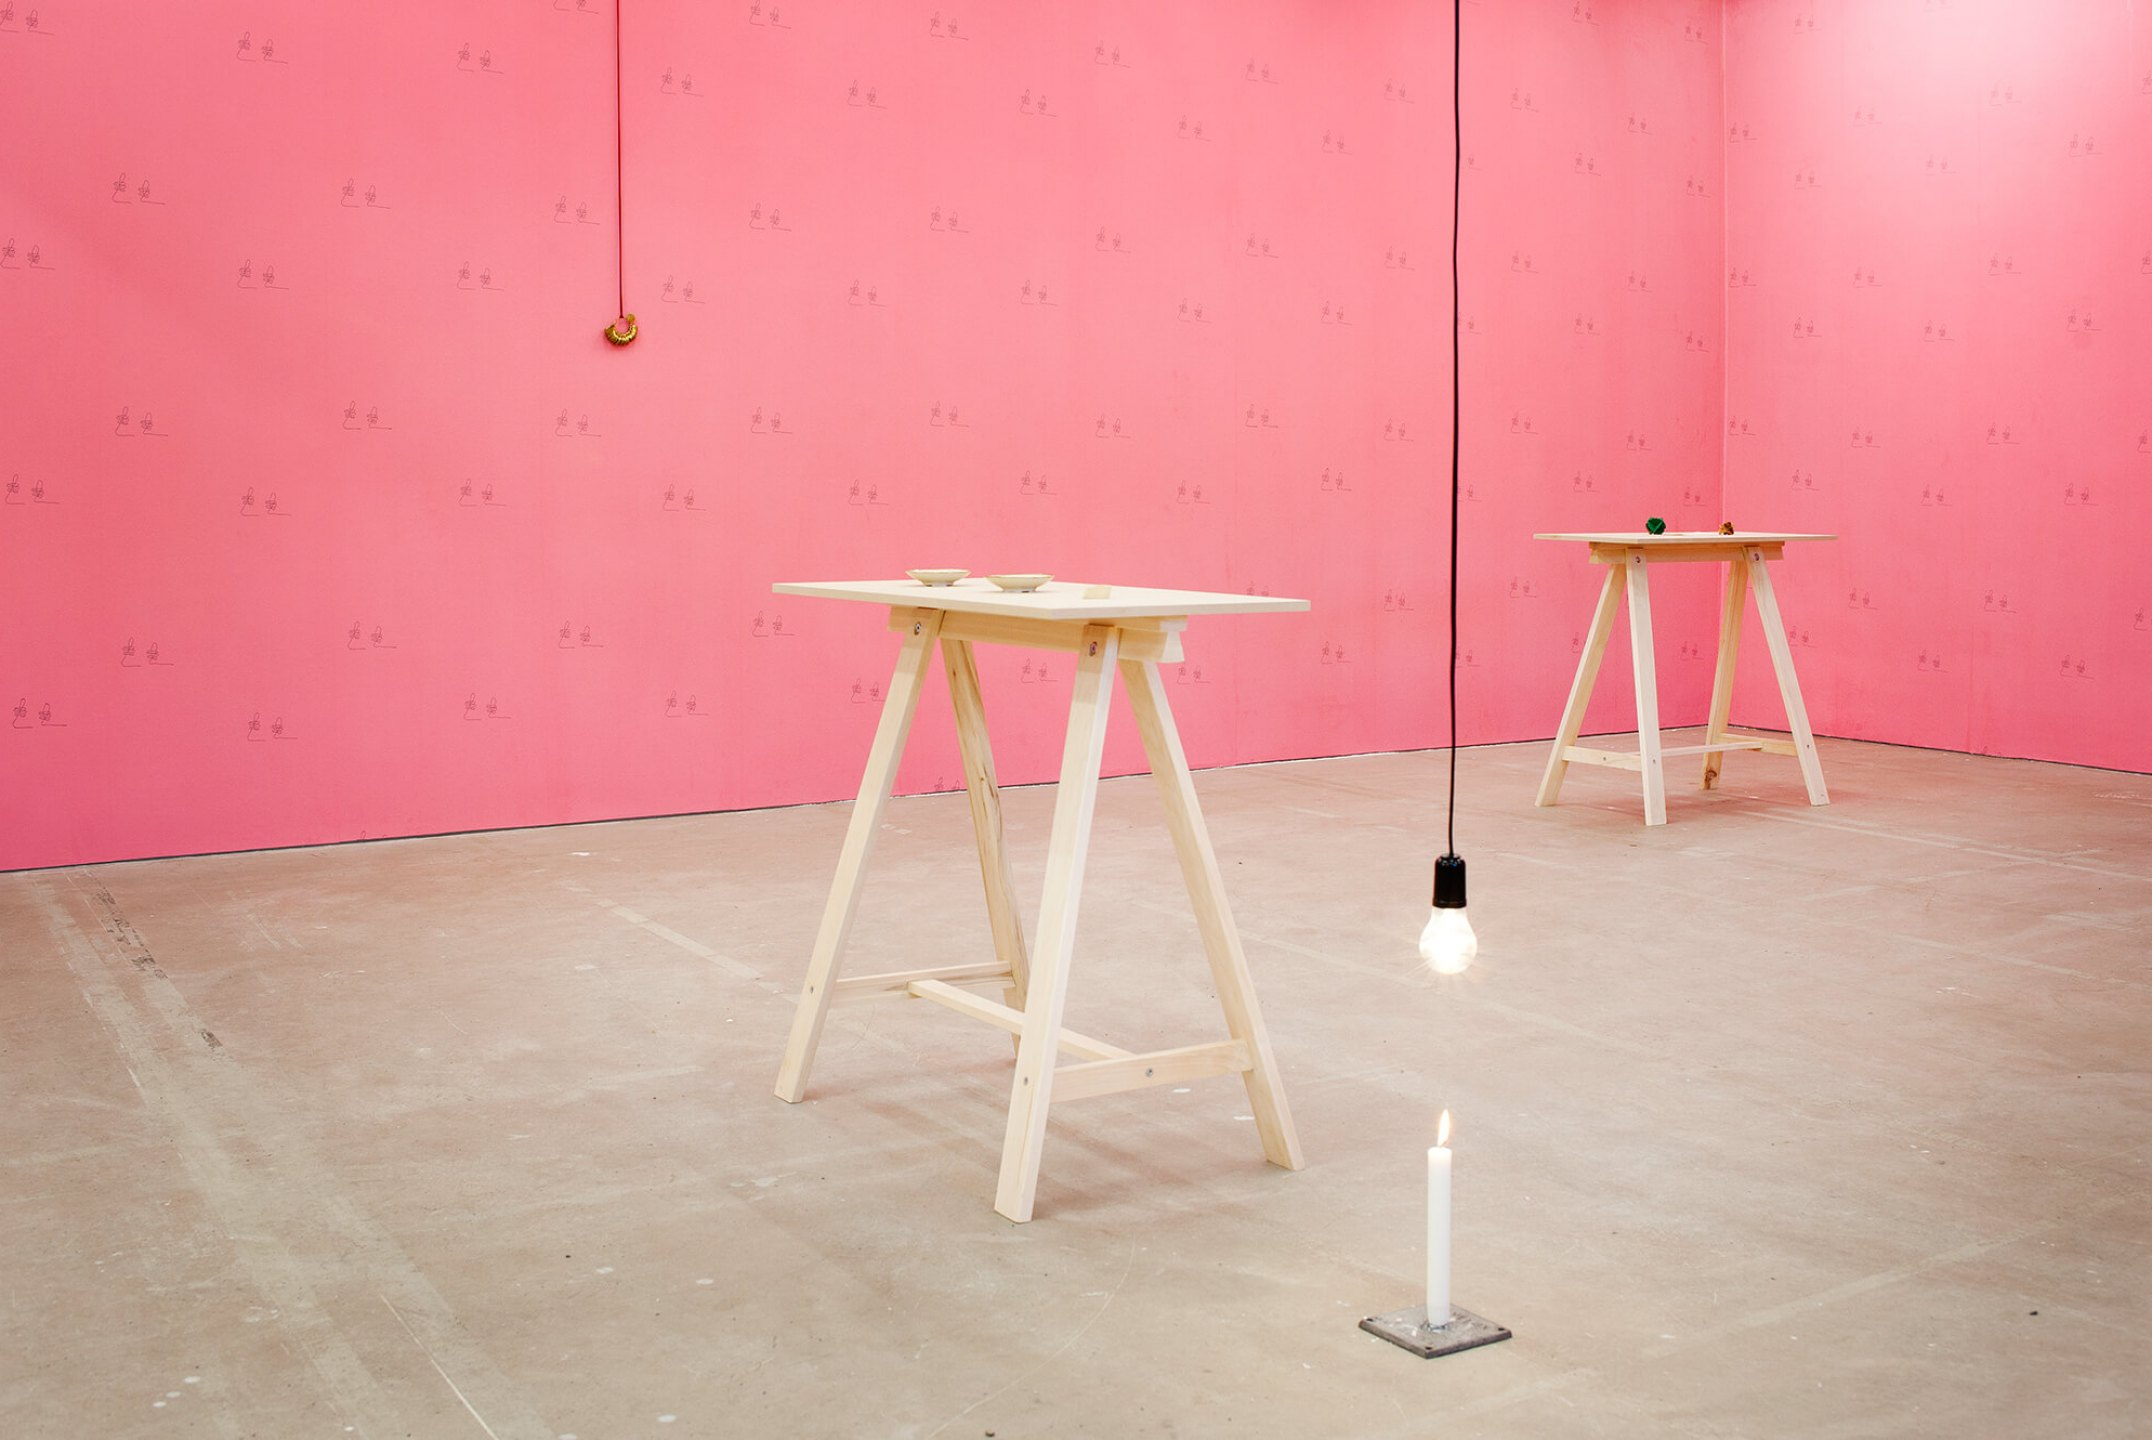 Runo Lagomarsino, <em>Even Heroes Grow Old,&nbsp;Index,</em> The Swedish Contemporary Art Foundation, Stockholm, 2012 - Mendes Wood DM